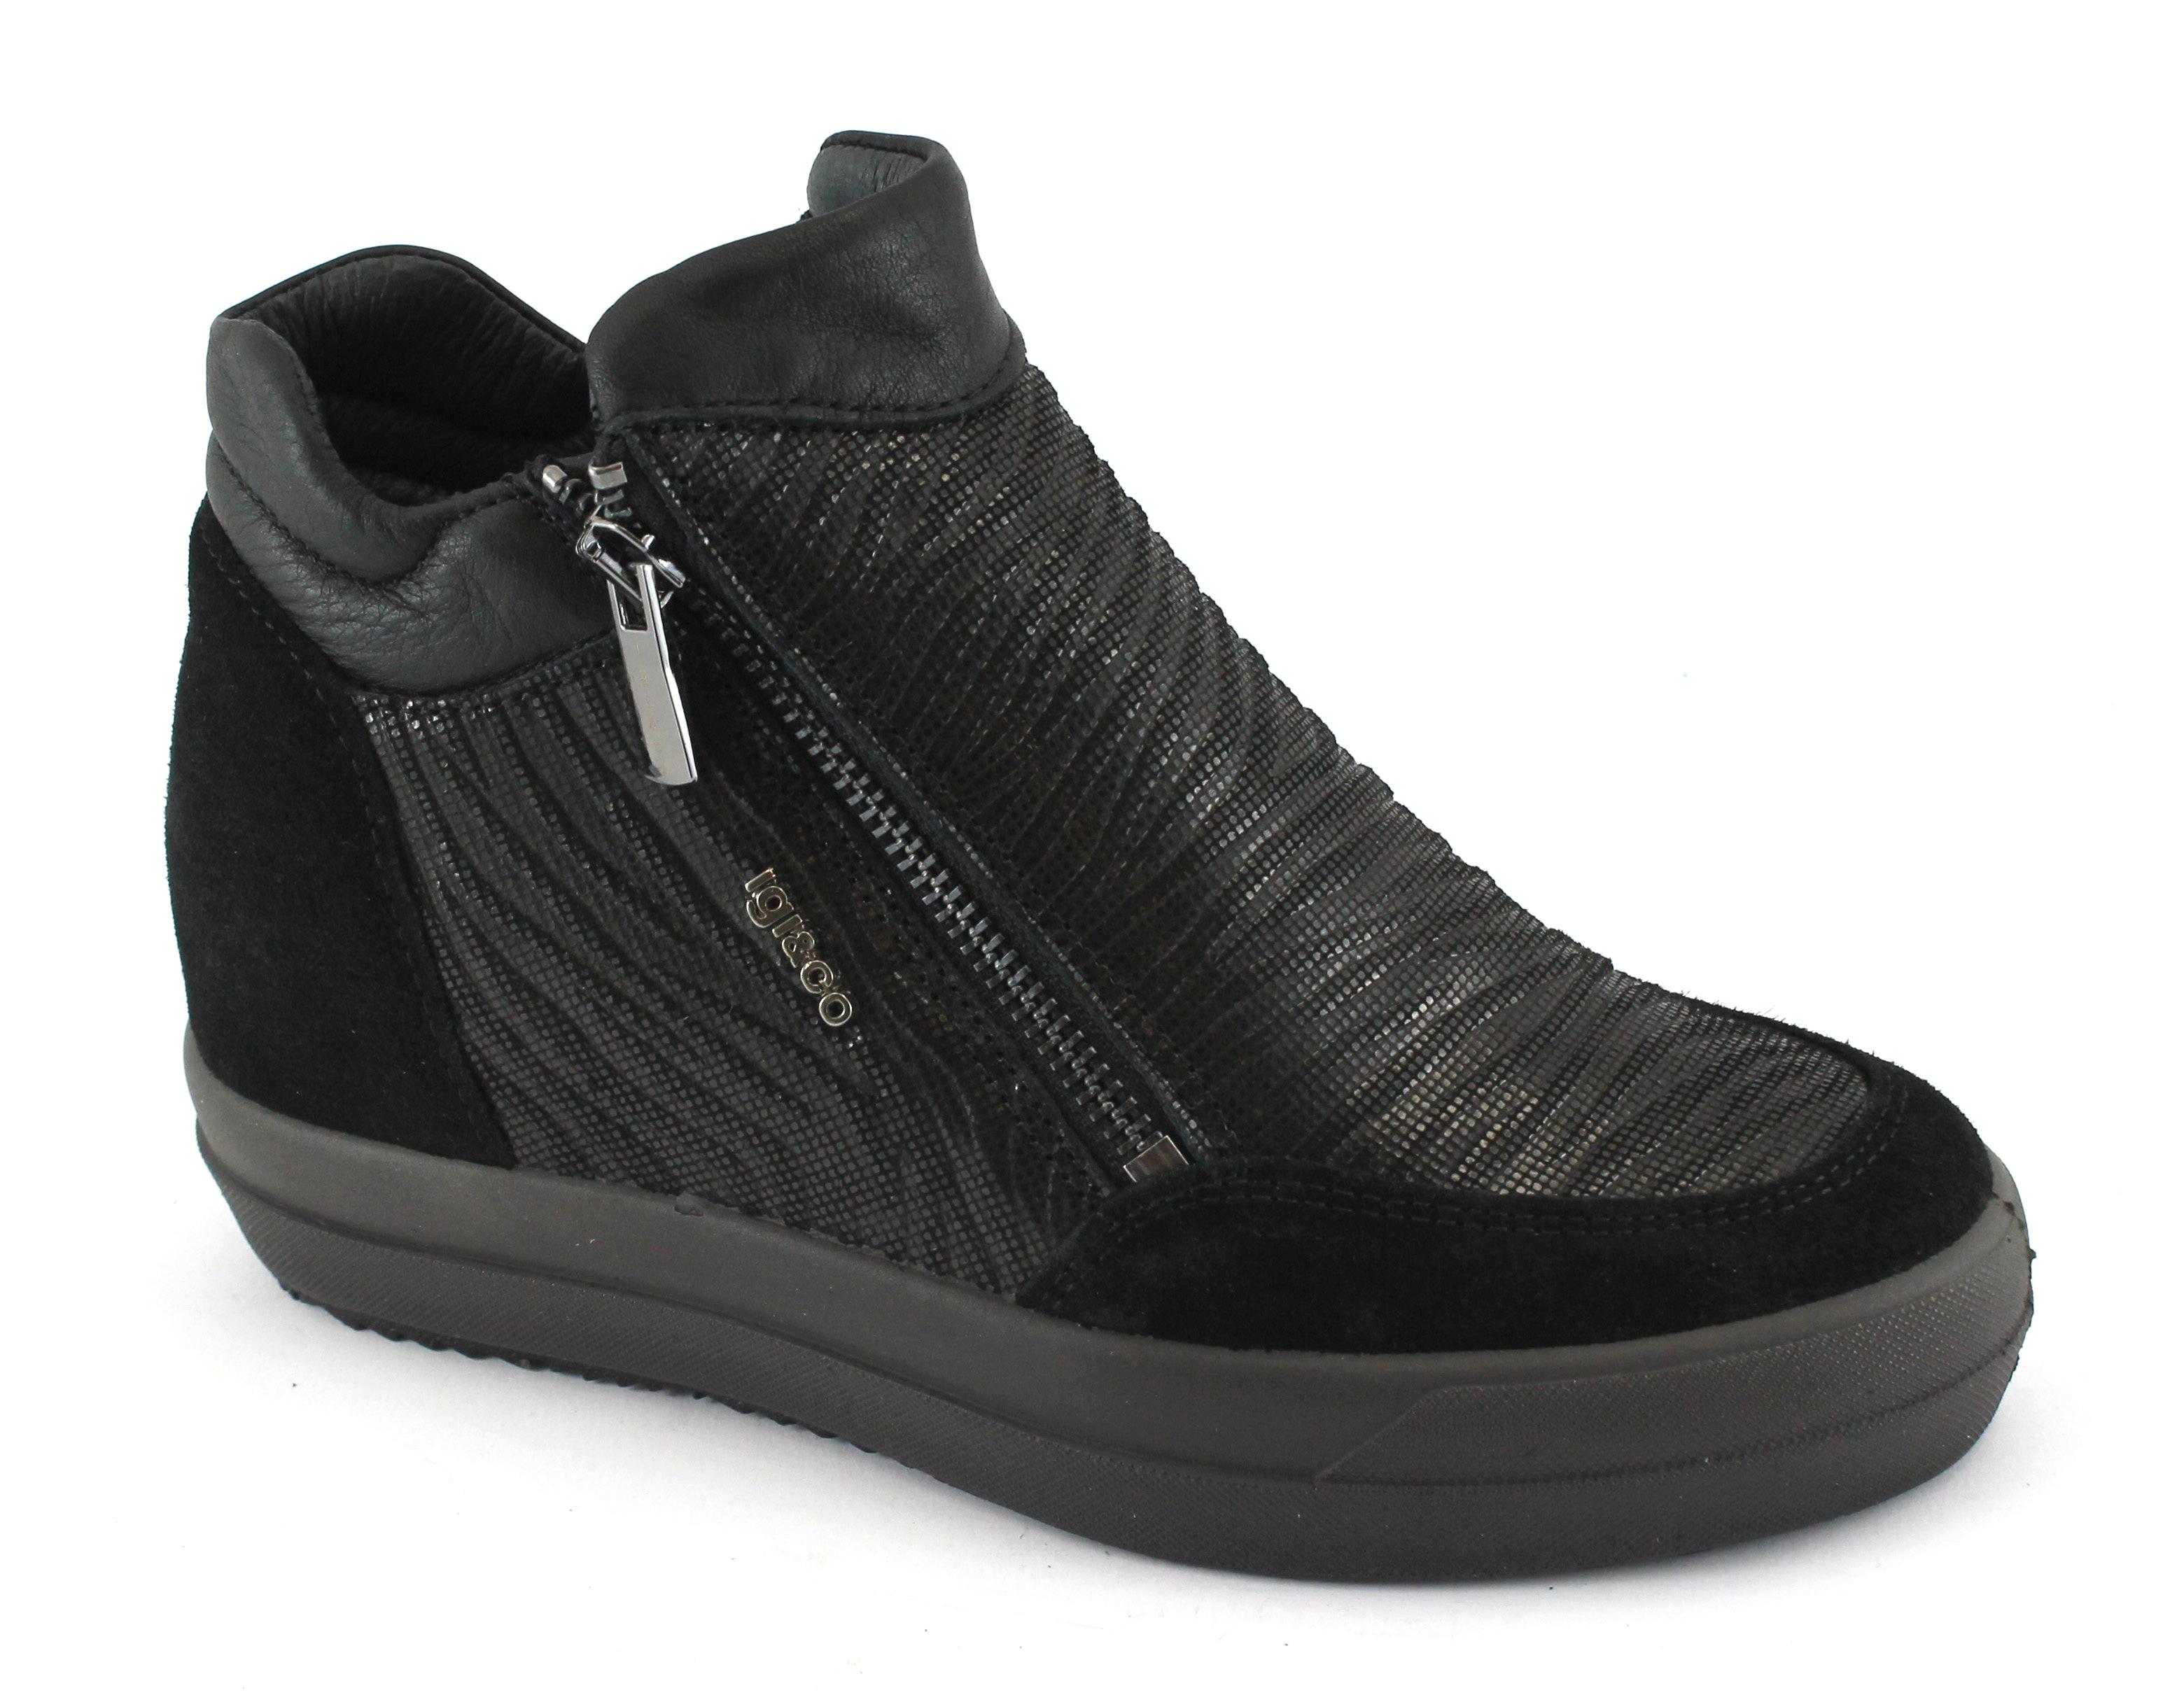 IGI&CO 87751 nero da scarpe donna  scarpe da nero ginnastica zeppa interna doppia zip 8d2d3d